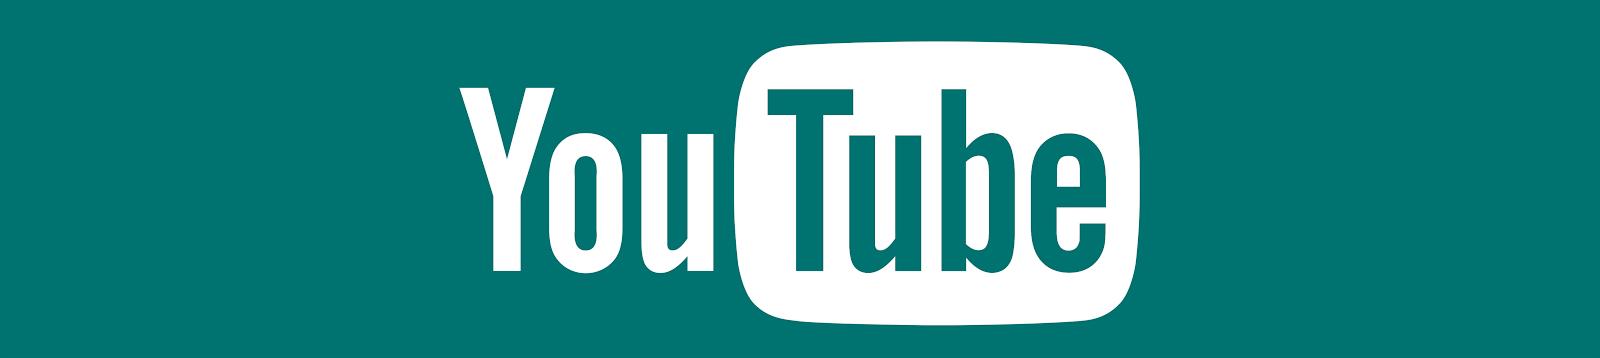 Veja meu Youtube